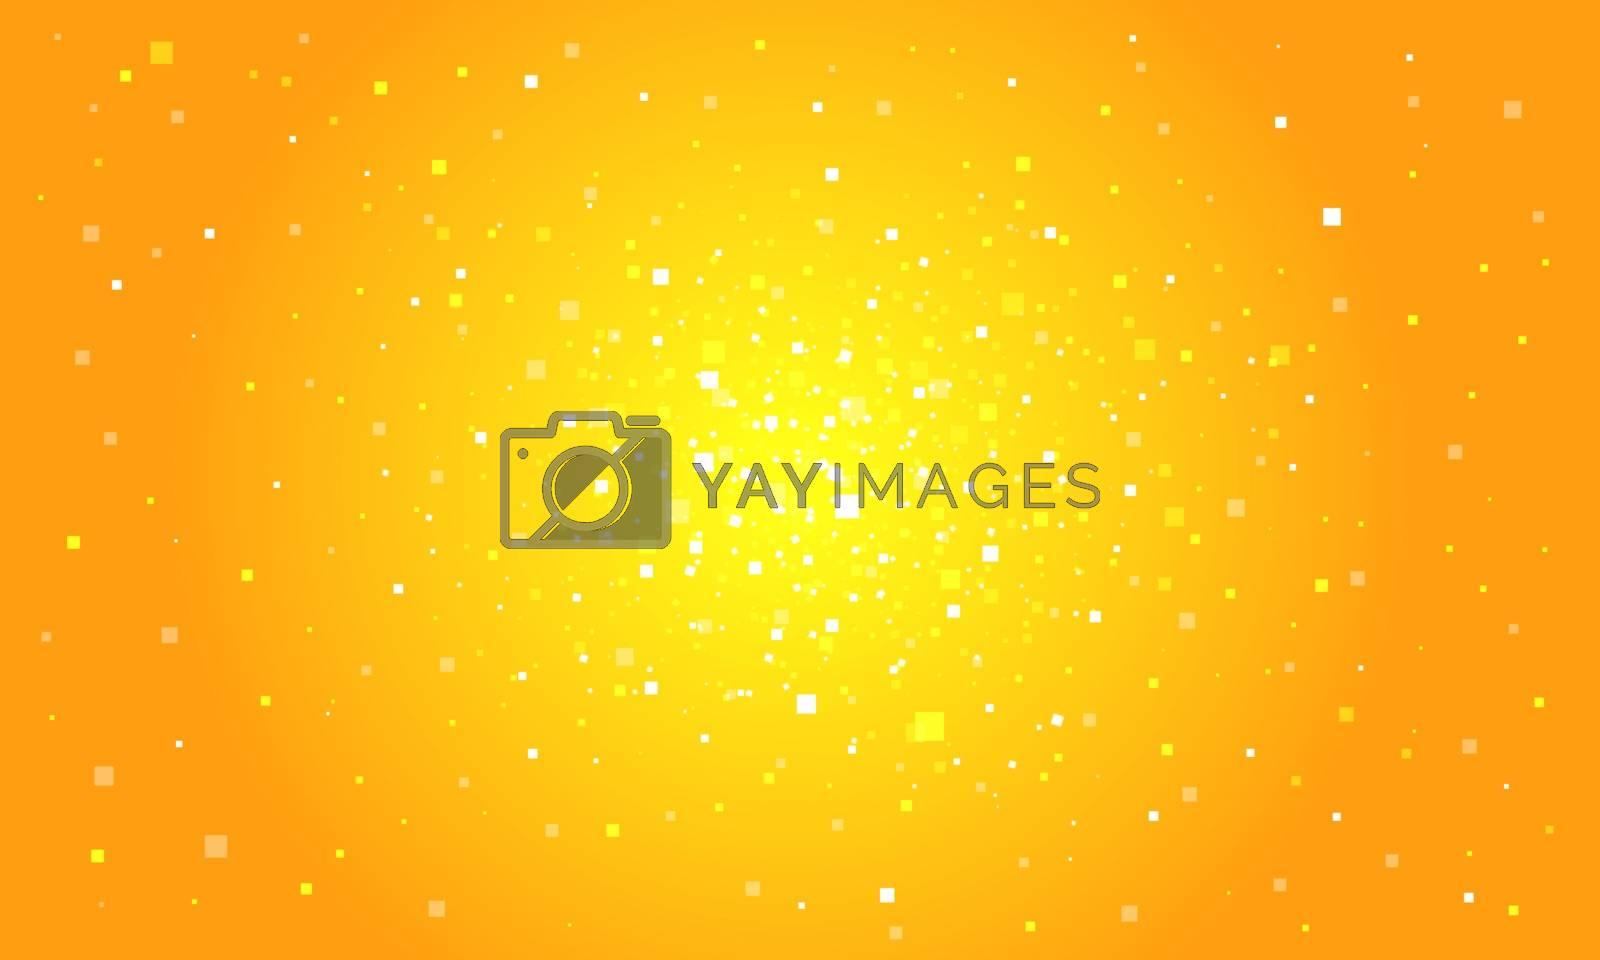 Orange digital background. Pop art retro vector illustration vintage kitsch 50s 60s style